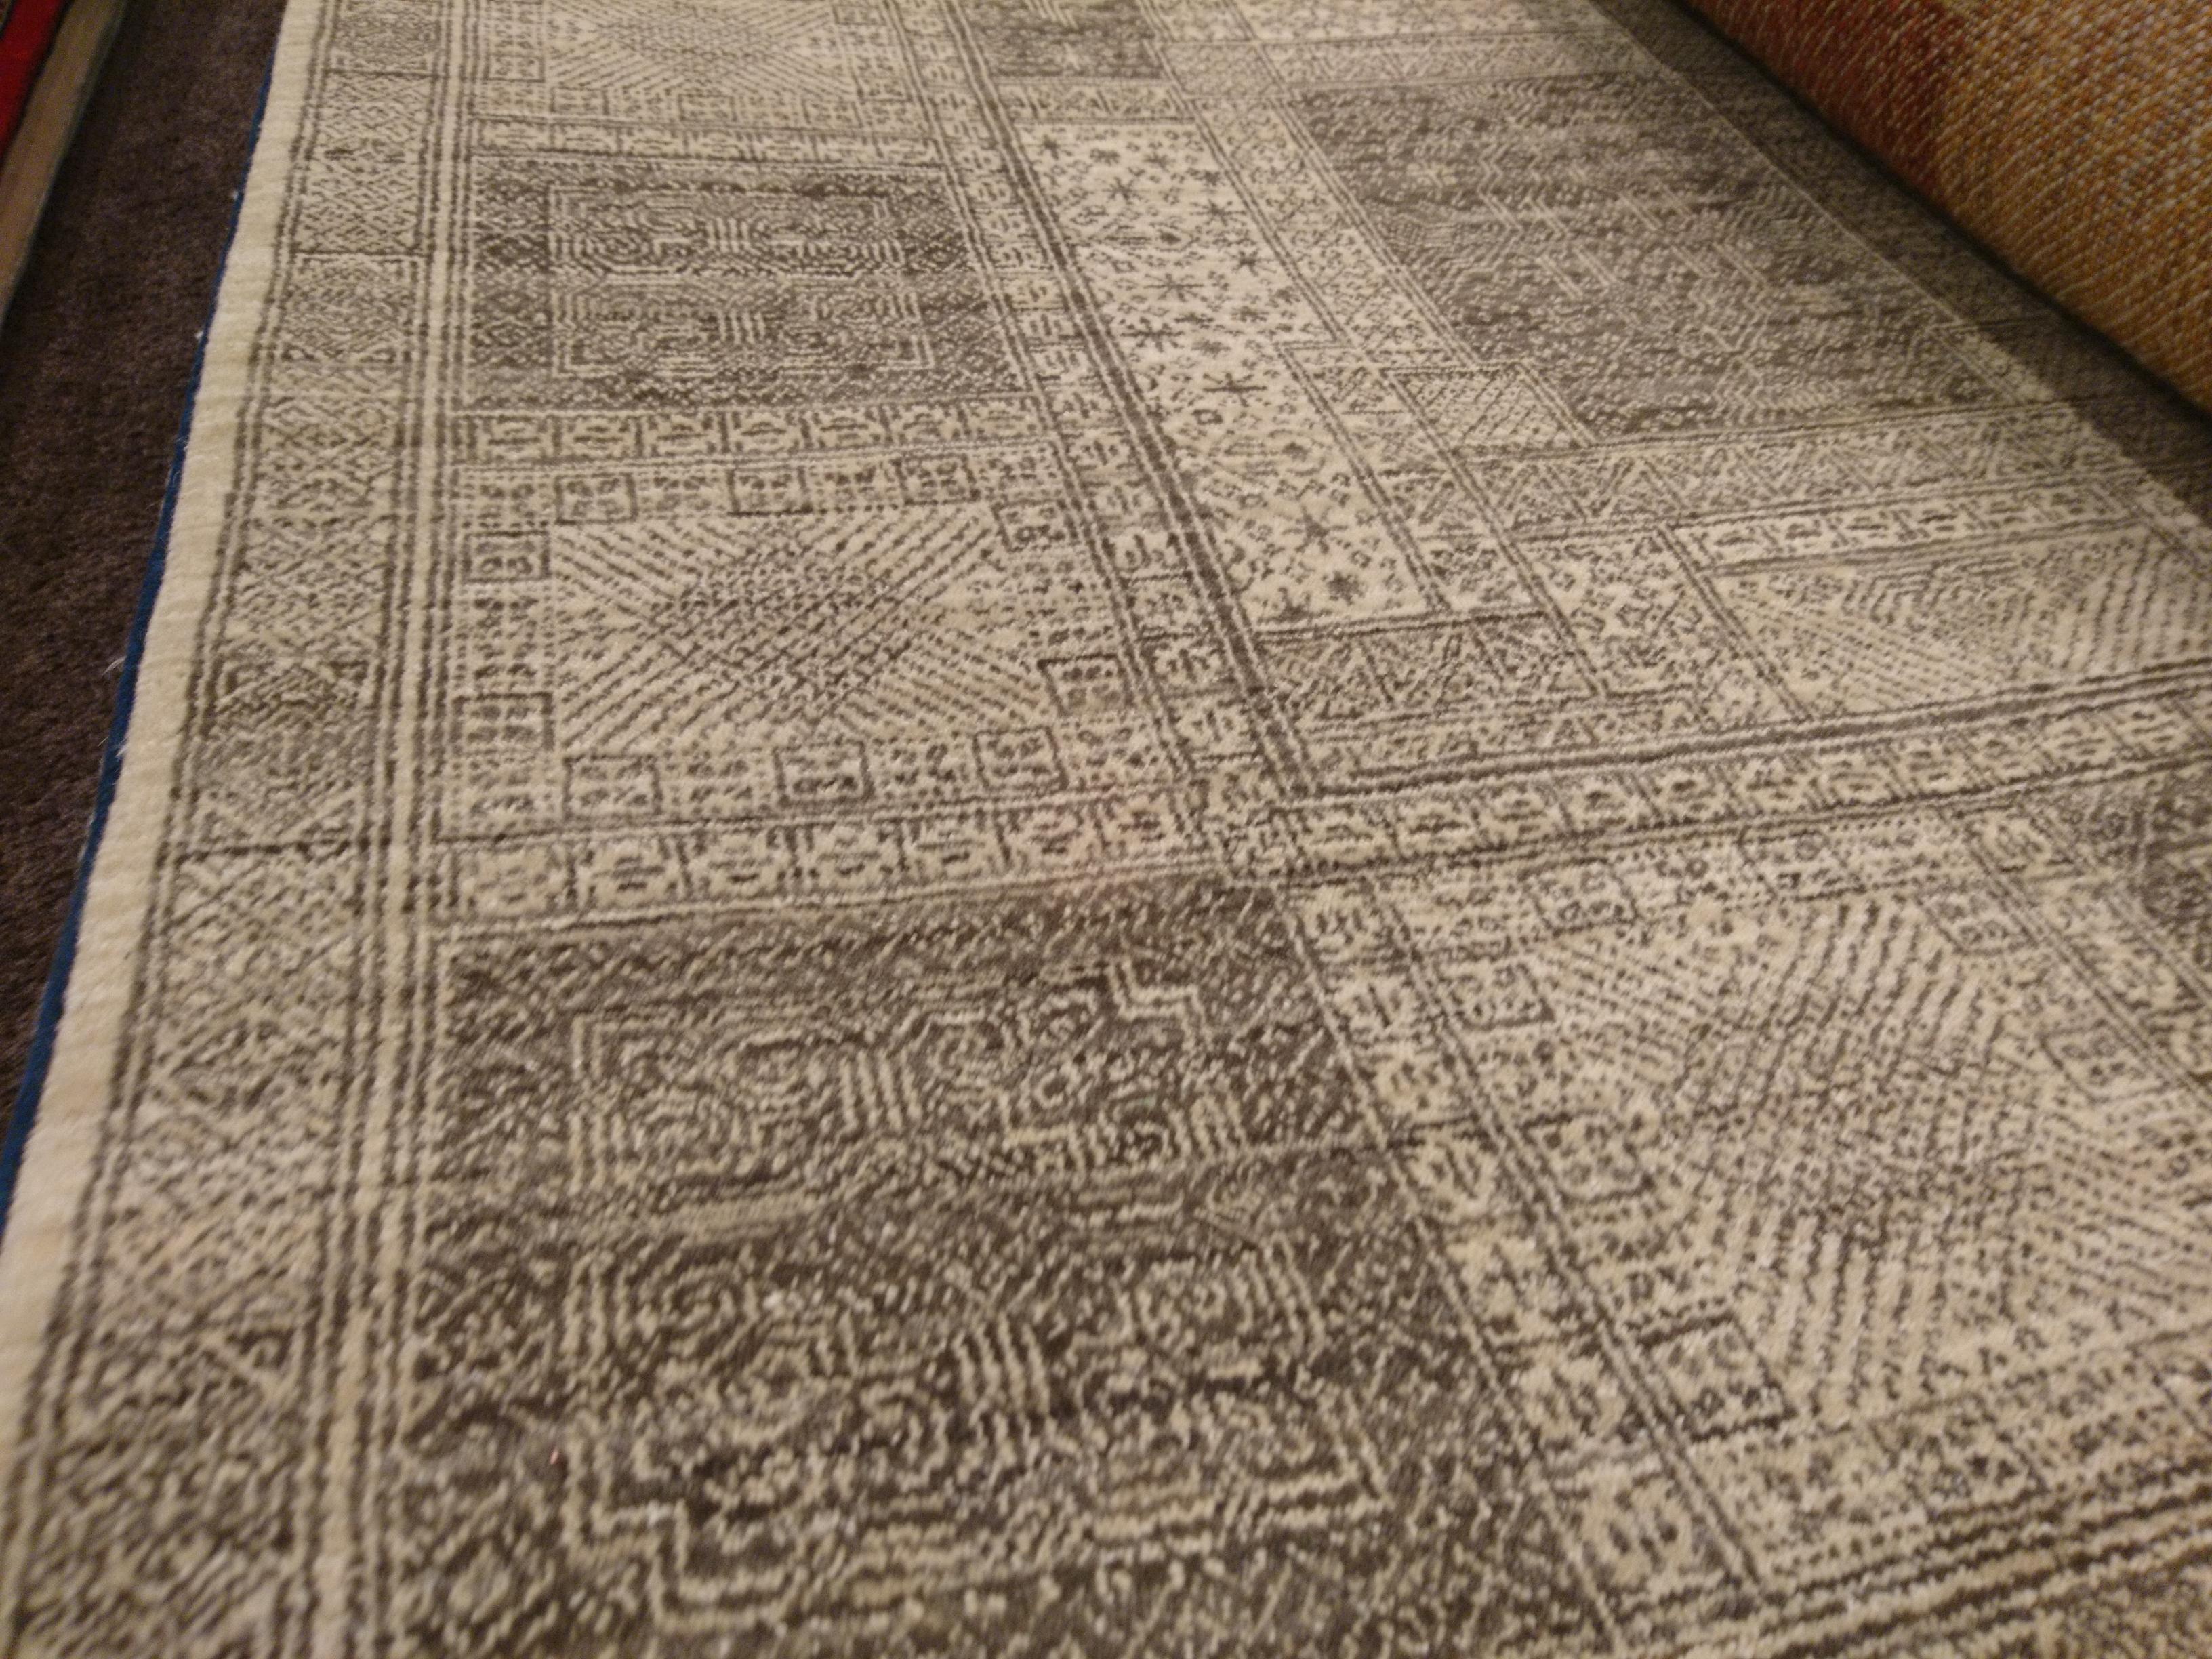 Perzisch Tapijt Rotterdam : Zelf perzisch tapijt reinigen. zelf tapijt reinigen zoek naar